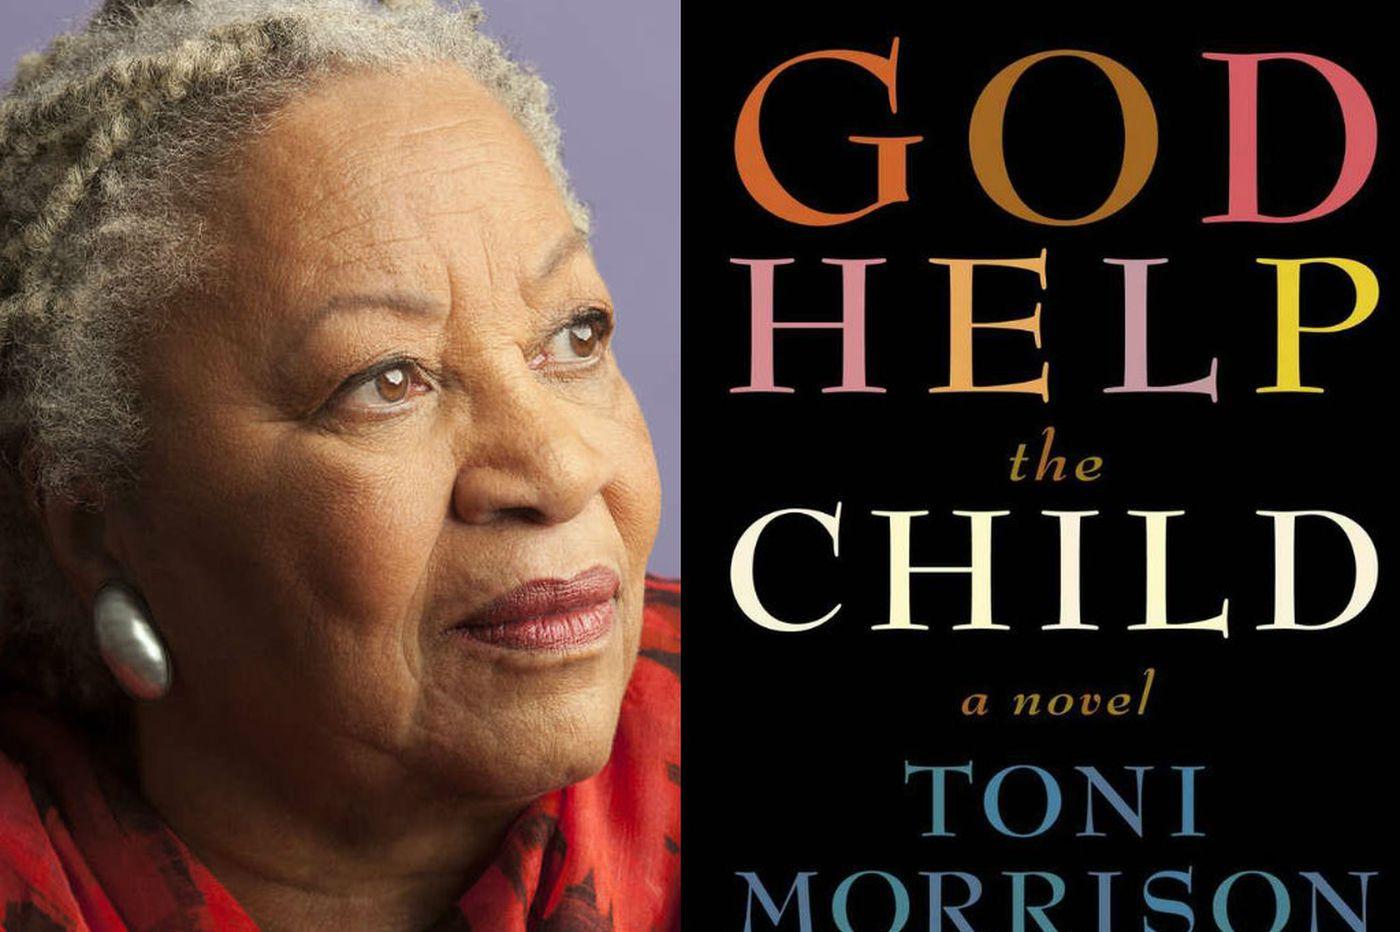 Toni Morrison's 'God Help the Child': Glorious, incendiary